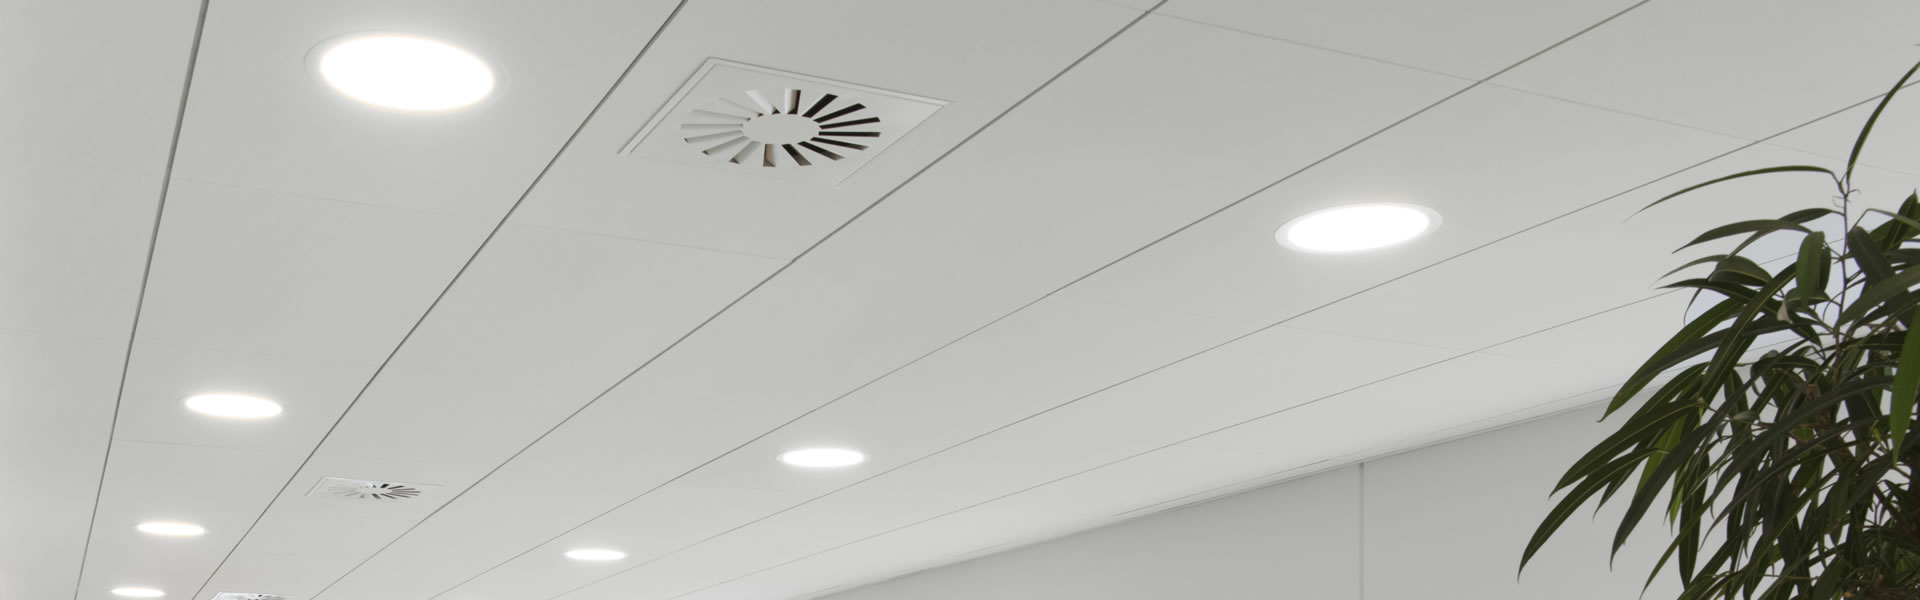 Rockfon ceiling tiles